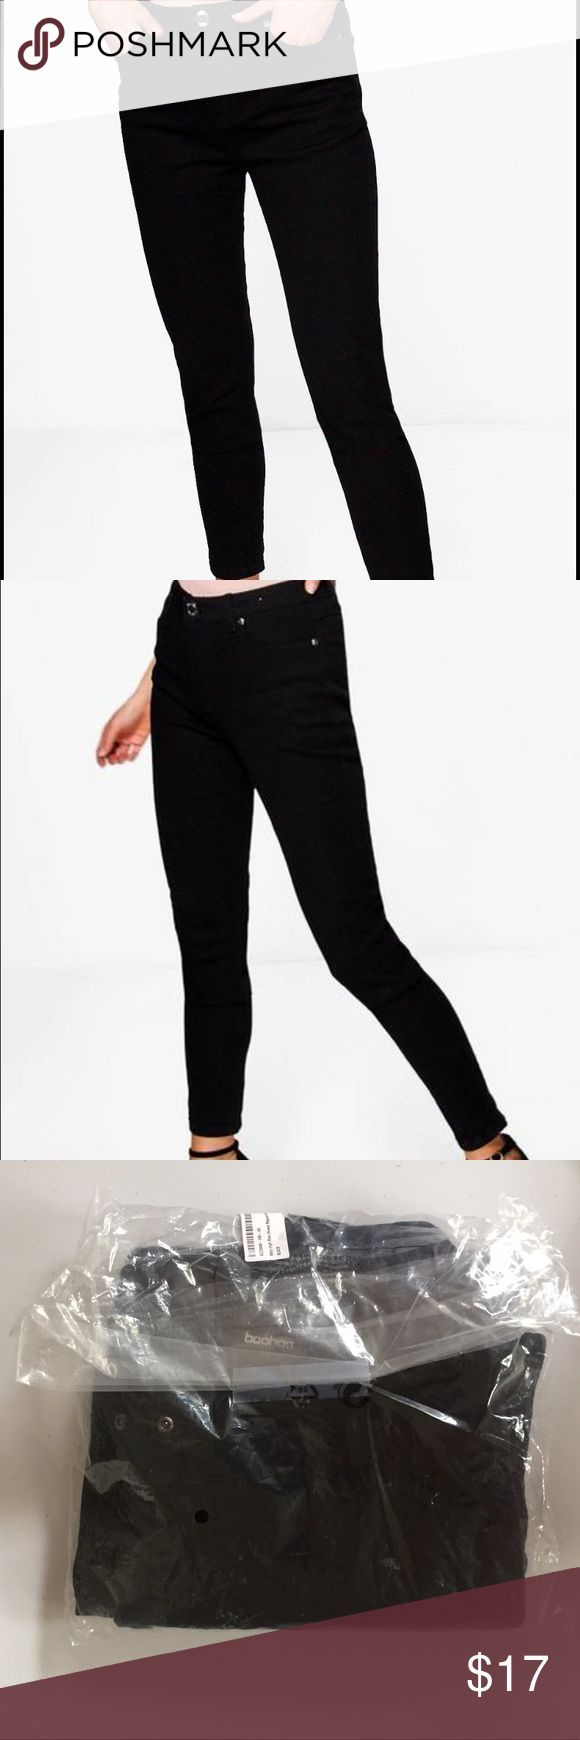 Black Skinny Jeans Never Been Worn. BRAND NEW. Jess Mid Rise 32' Leg Skinny Jeans. Still in original packaging. Size 12. Boohoo Jeans Skinny